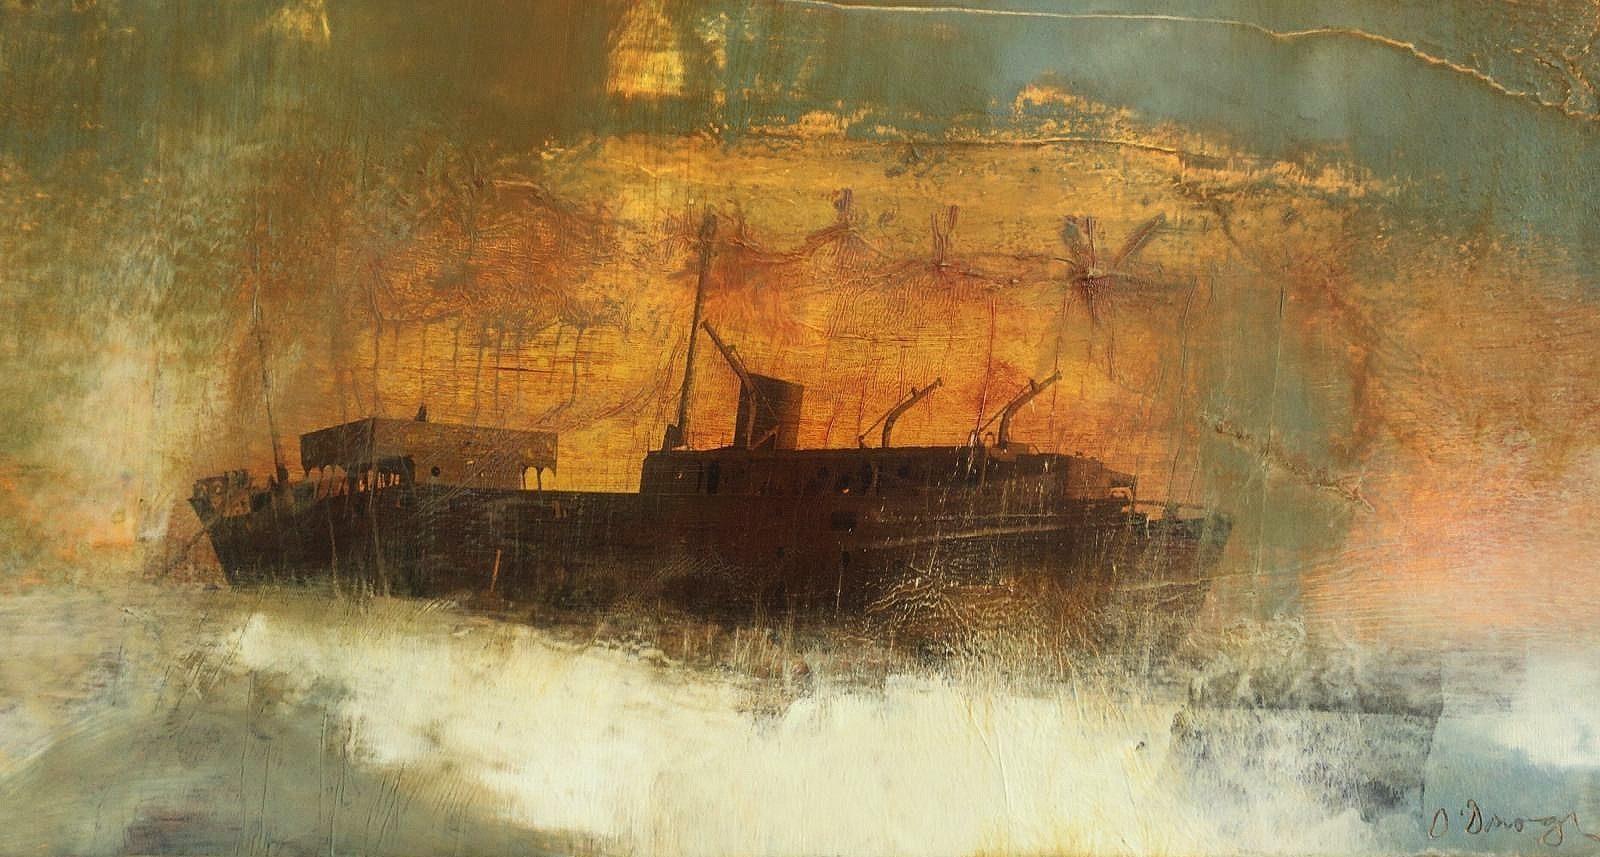 Hughie O'Donoghue (RA), Exodus 6, 2005. Courtesy of Castlegate House Gallery.